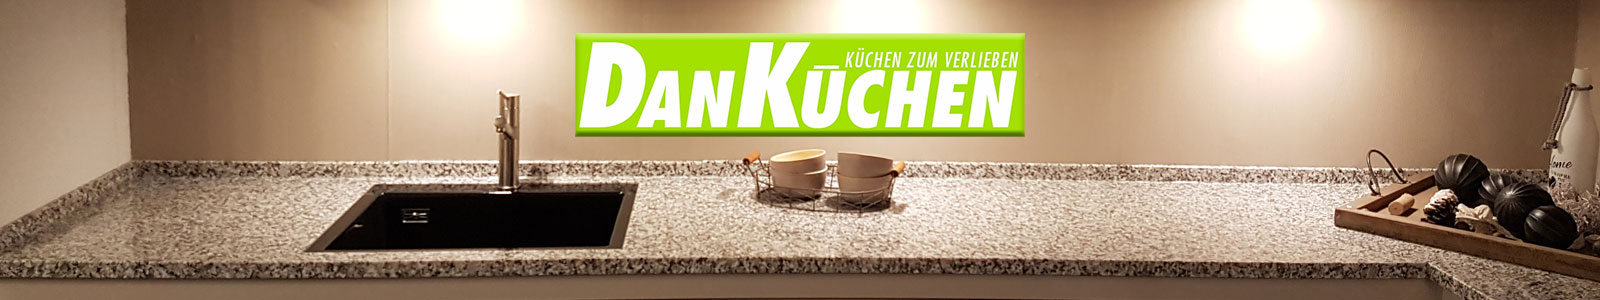 kuechenguide.com-dankuechen-eggenfelden-banner